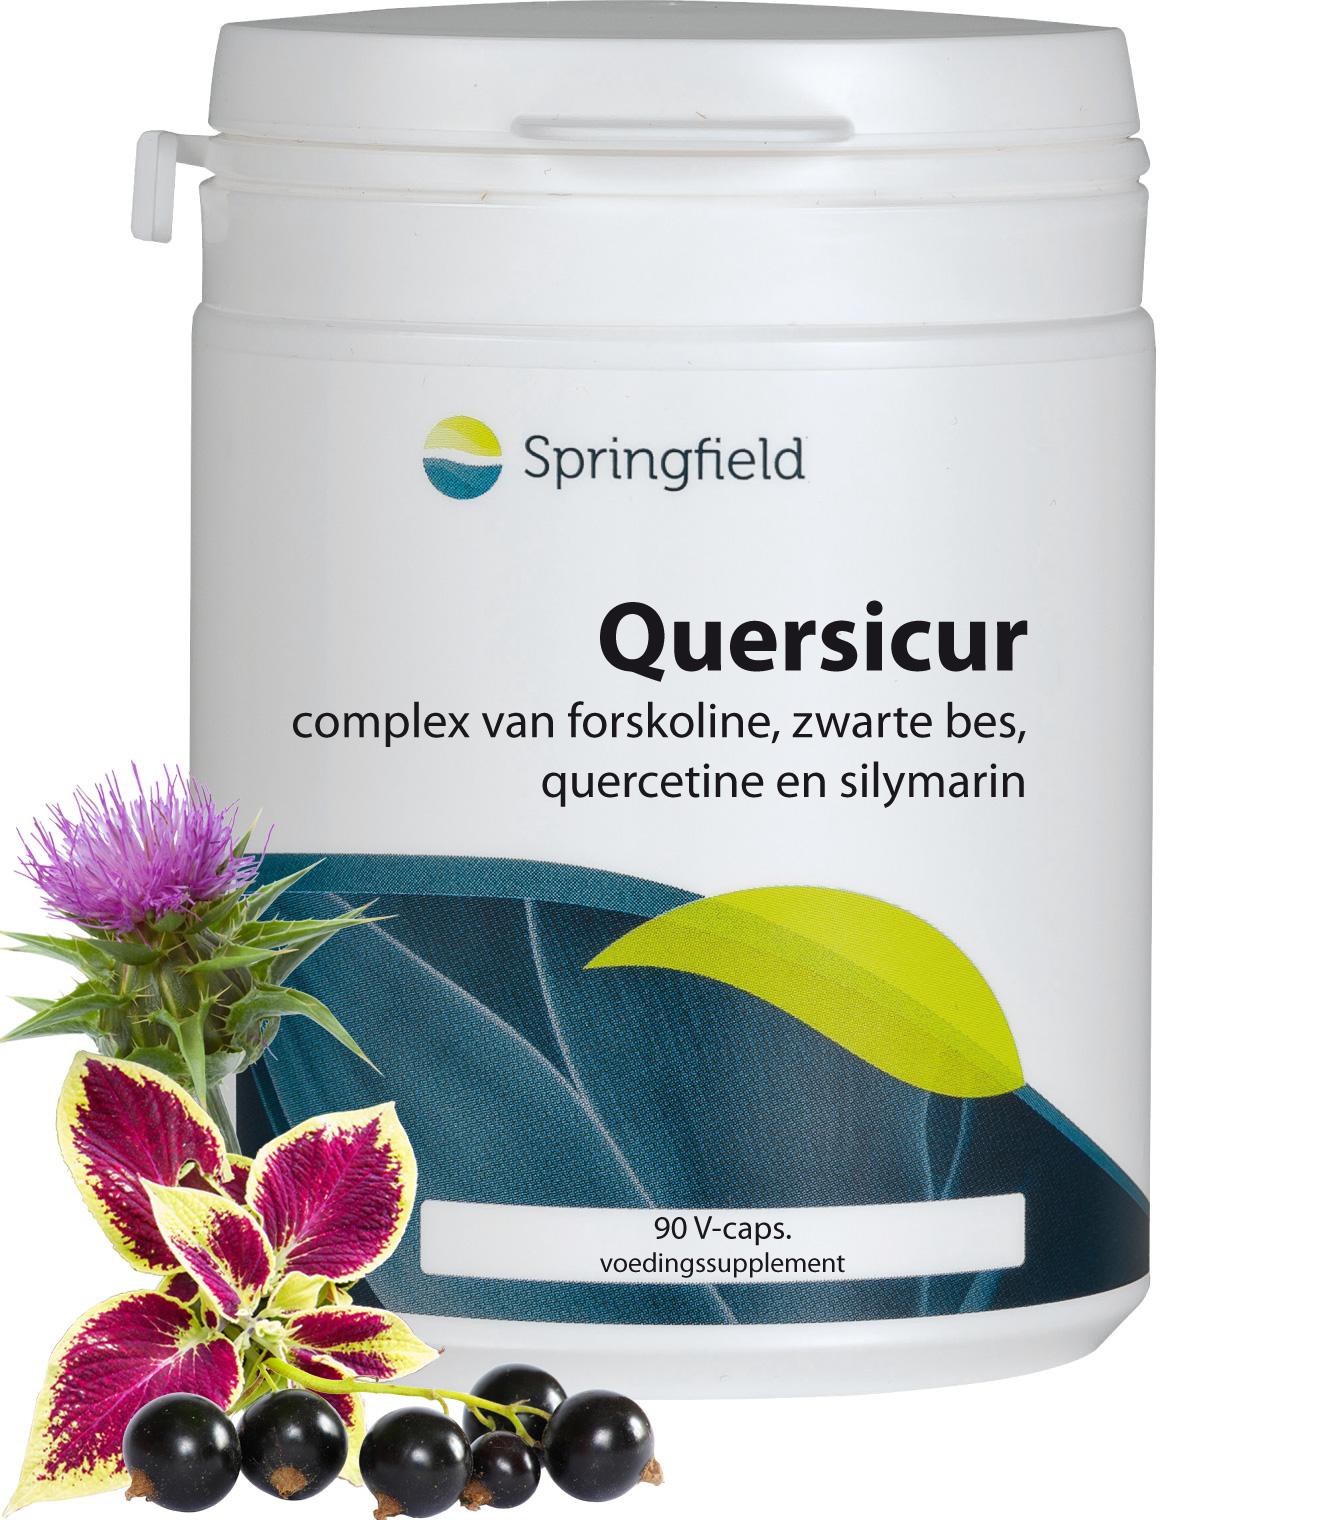 Quersicure met forskoline, zwarte bes, quercetine, silymarin